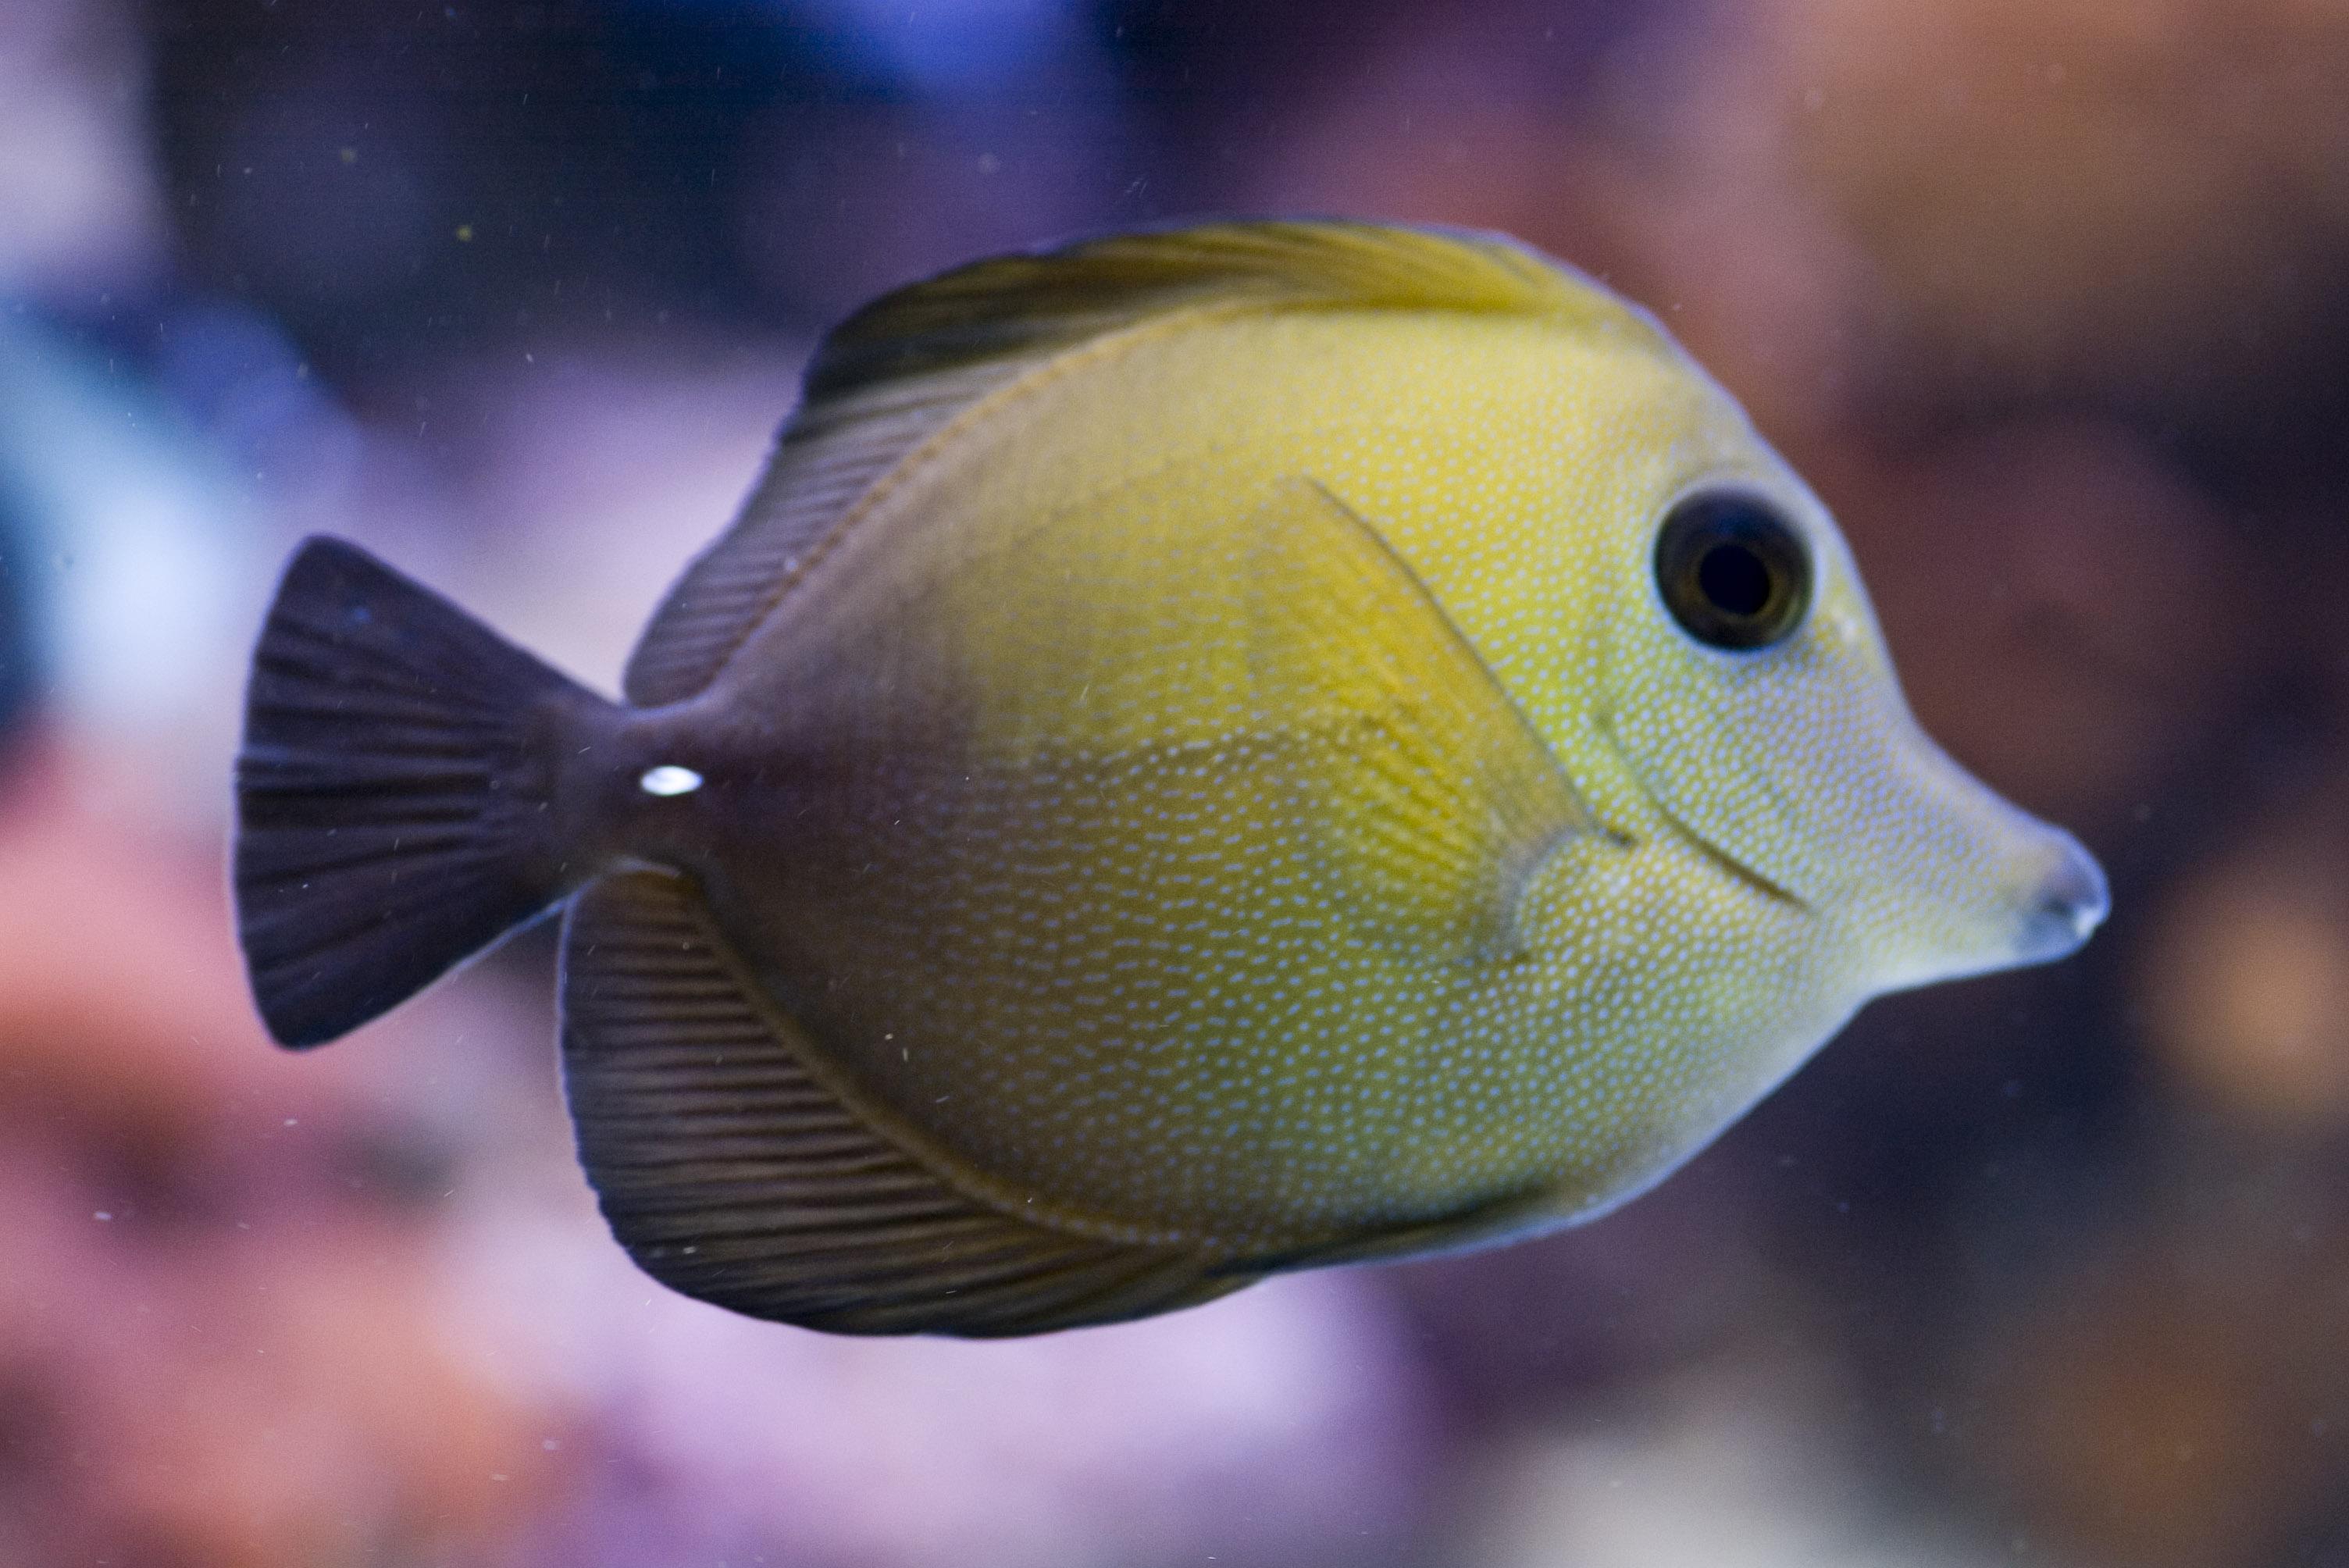 Free Stock Photo 1256-tank_fish_P1541.jpg | freeimageslive